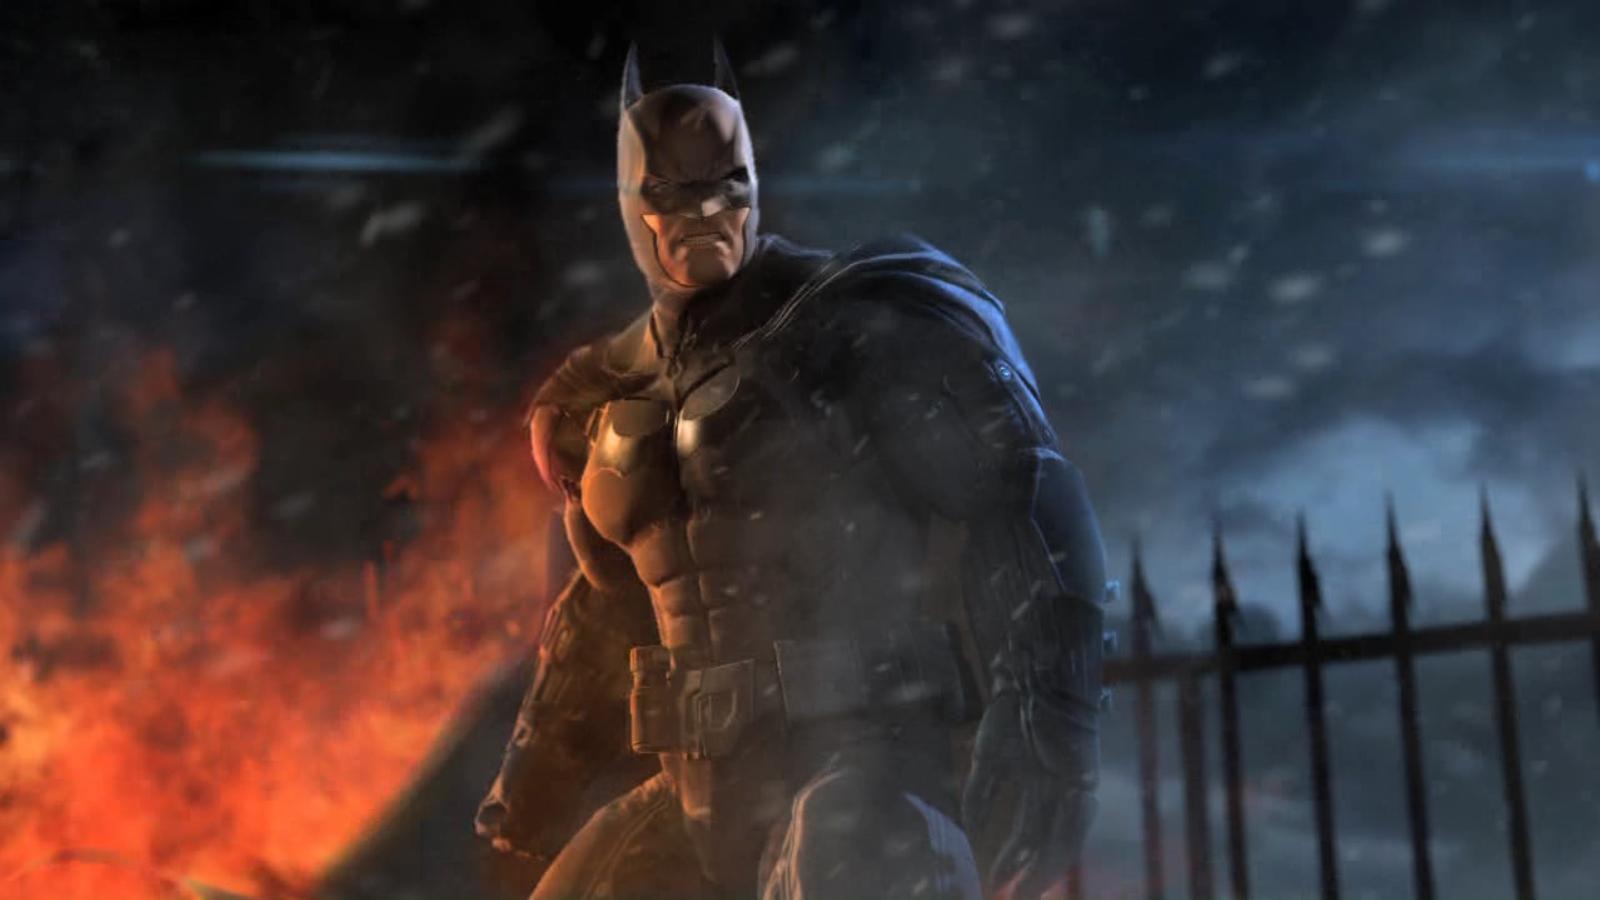 BatmanOrigins 2018-08-05 11-35-34-53.jpg - Batman: Arkham Origins